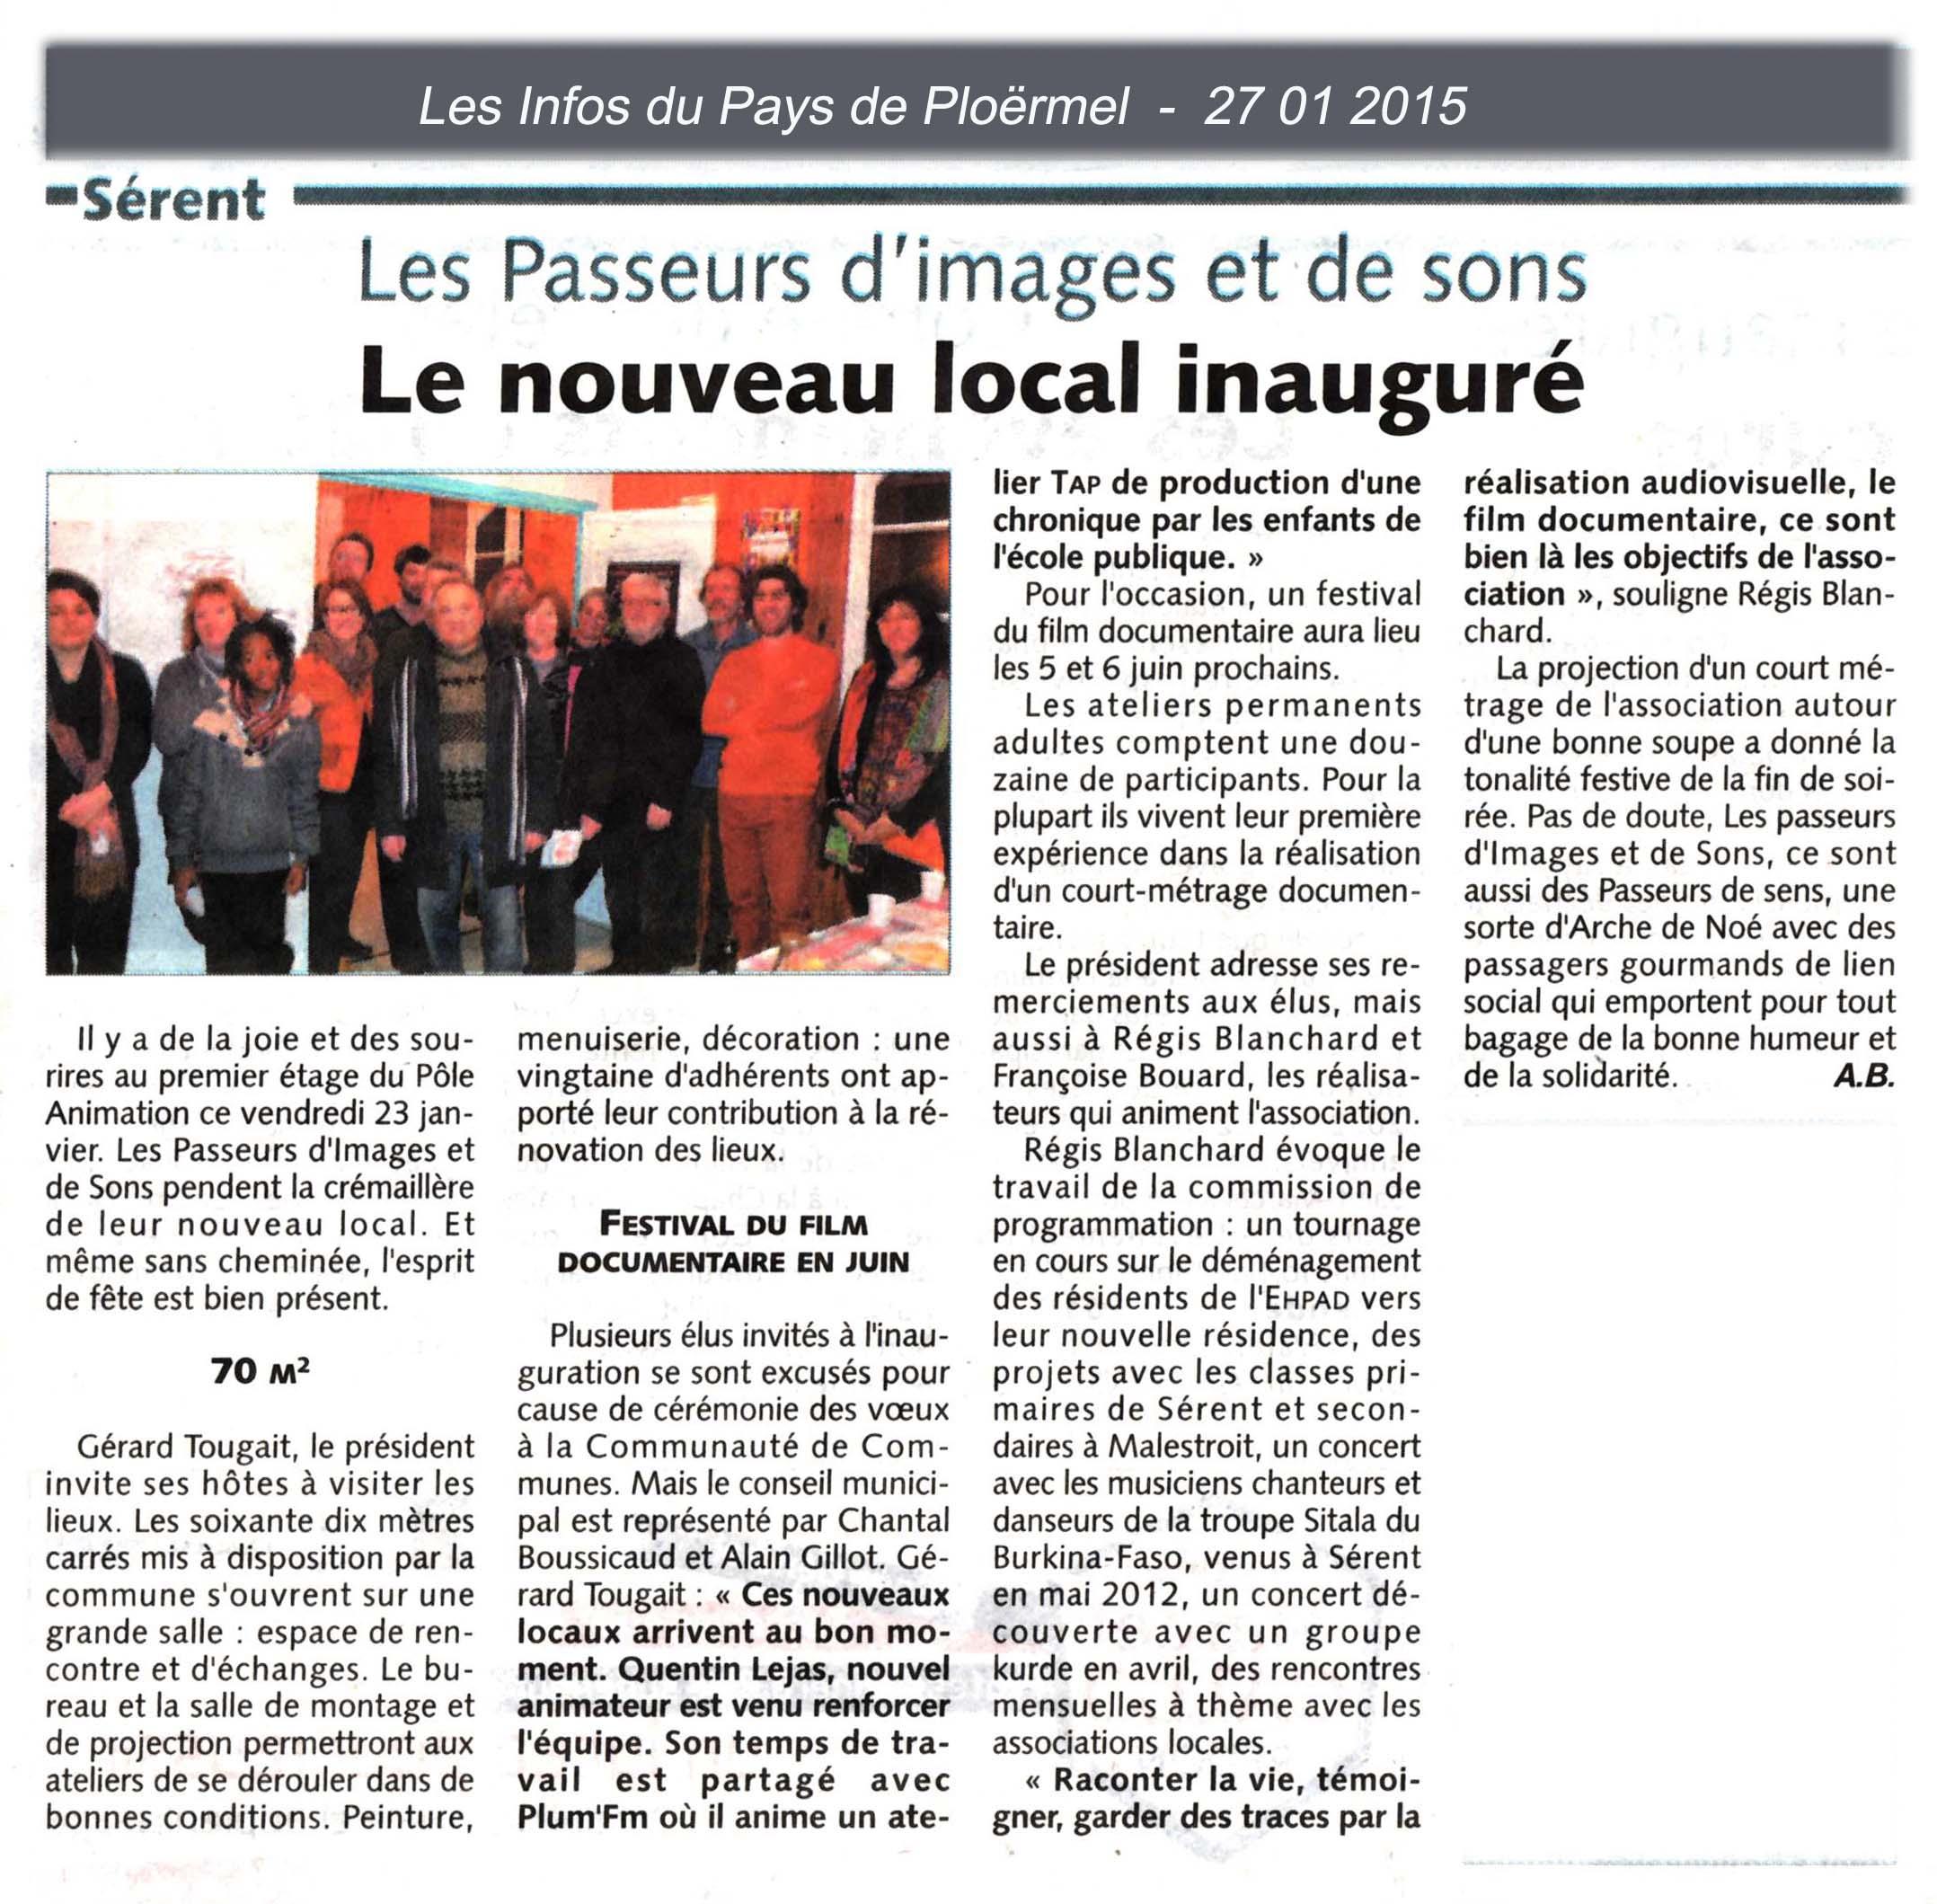 Inauguration local